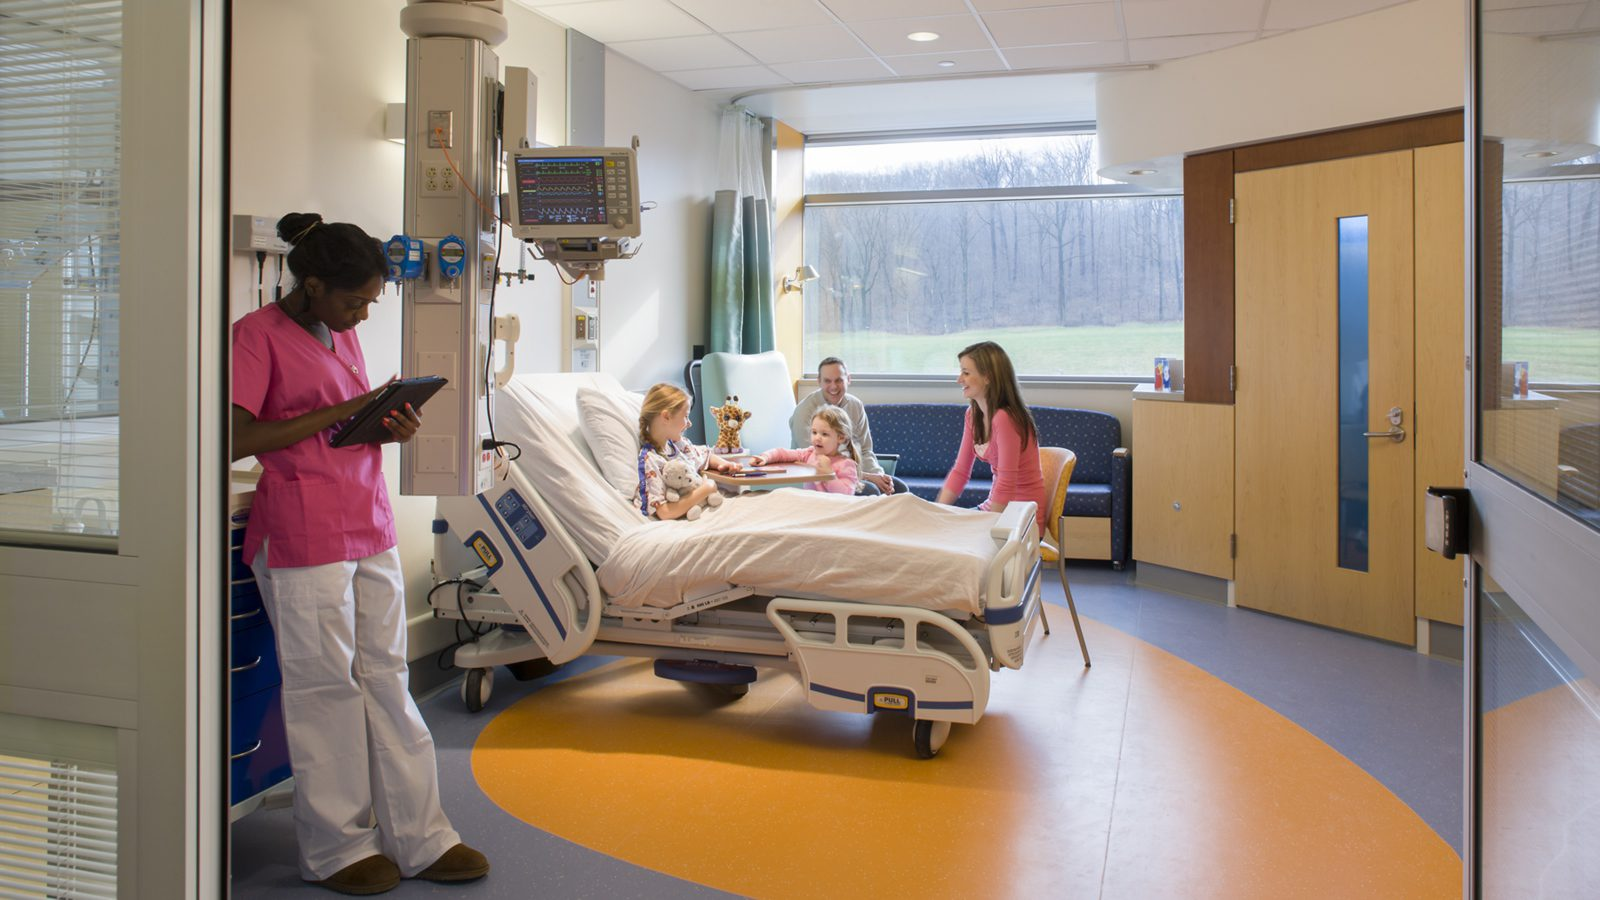 hospi lurie childrens hospital - HD1920×1280